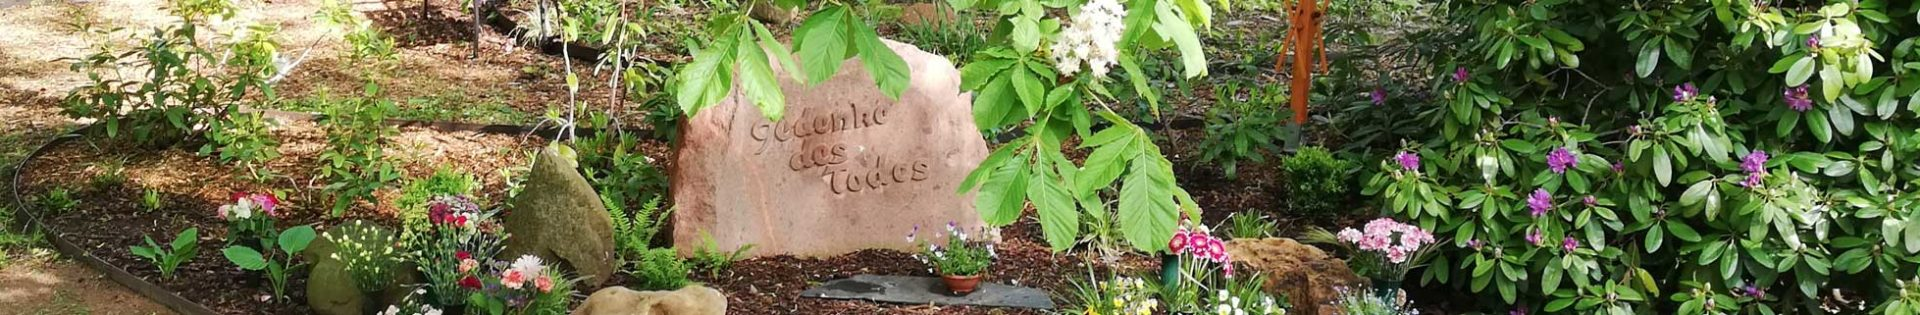 Friedhof Hartha - Formen der Bestattung